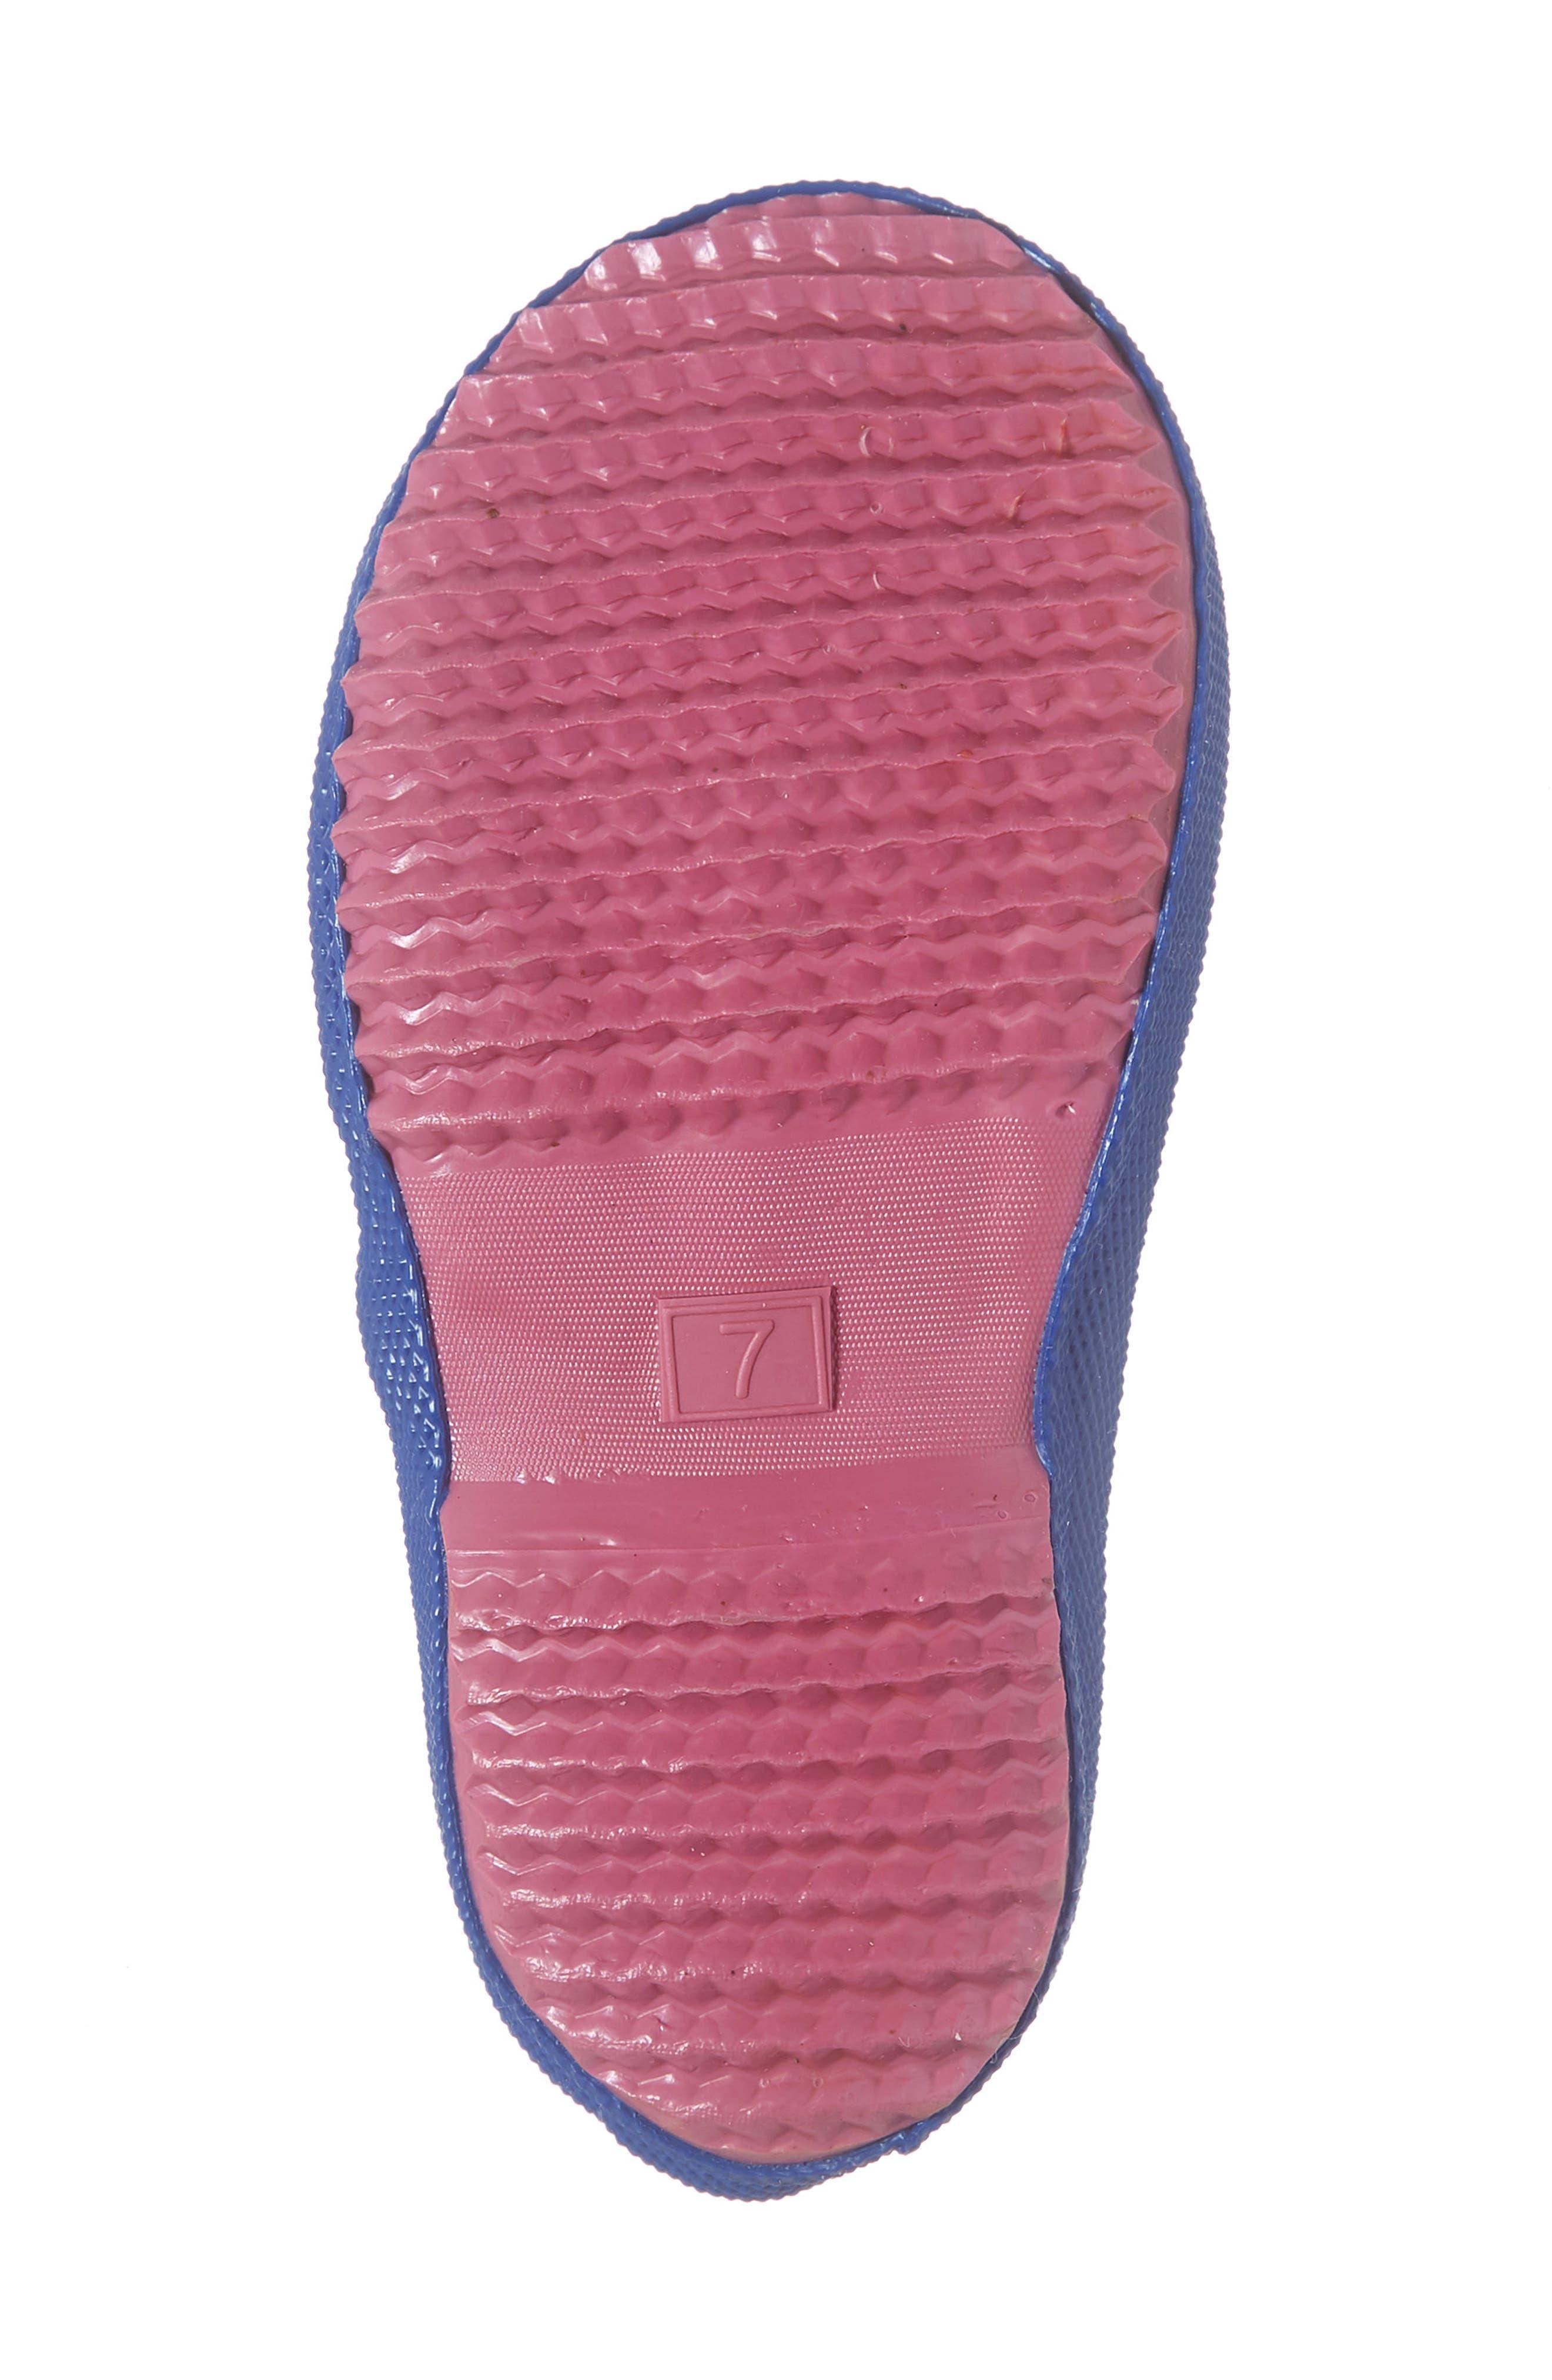 JOULES, Print Waterproof Rain Boot, Alternate thumbnail 6, color, BLUE CONFETTI FLORAL